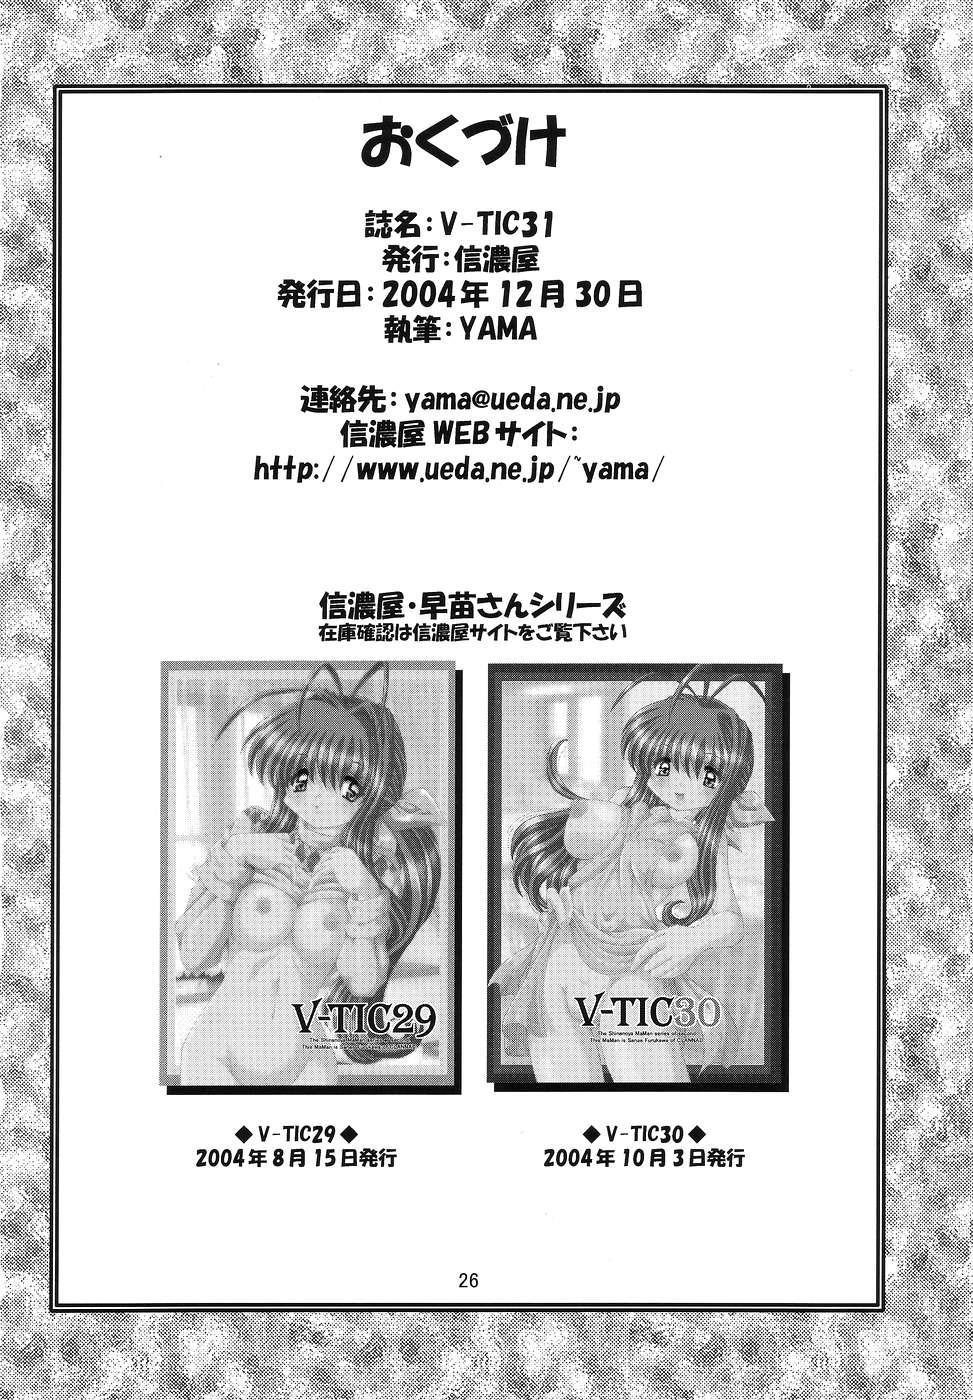 V-TIC31 24